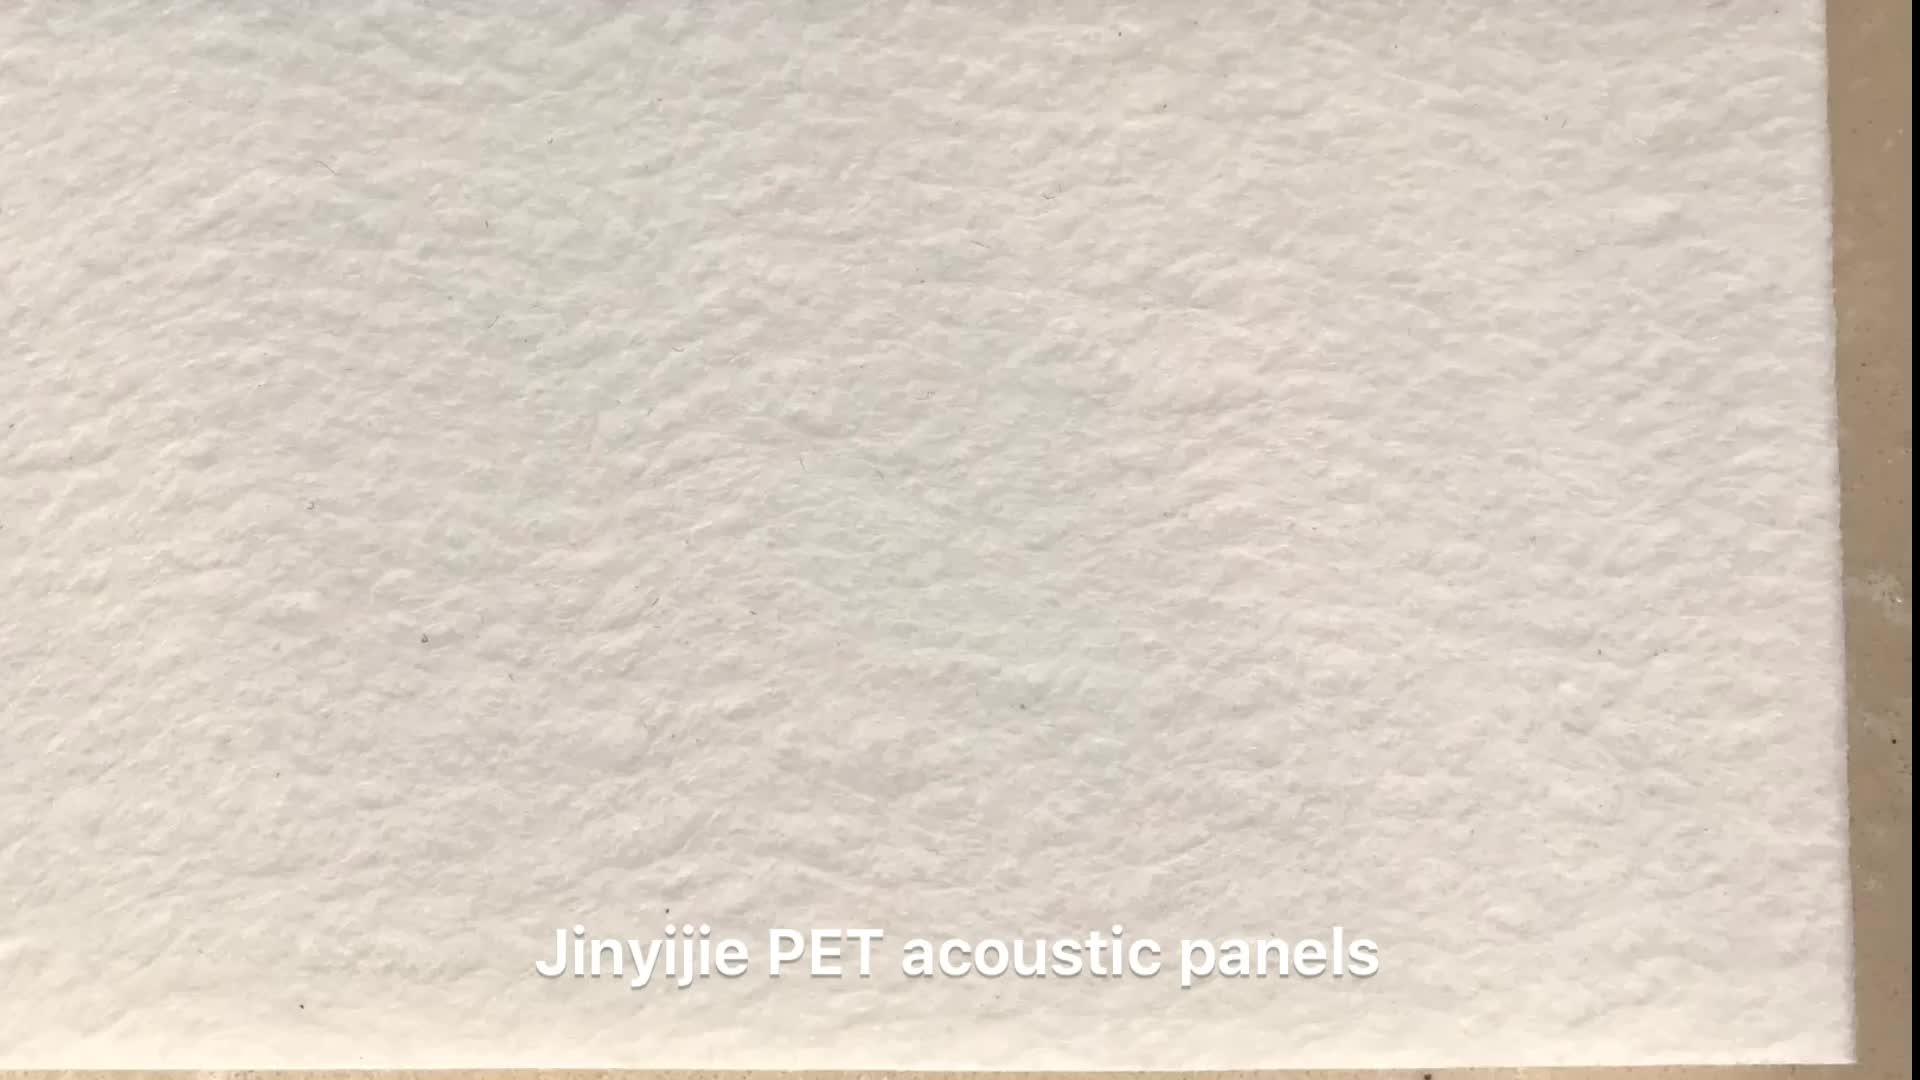 Perforated pinta acoustic ceiling tiles polyester fiber foam polyurethane acoustic foam pyramid foam quietspace ceiling tiles